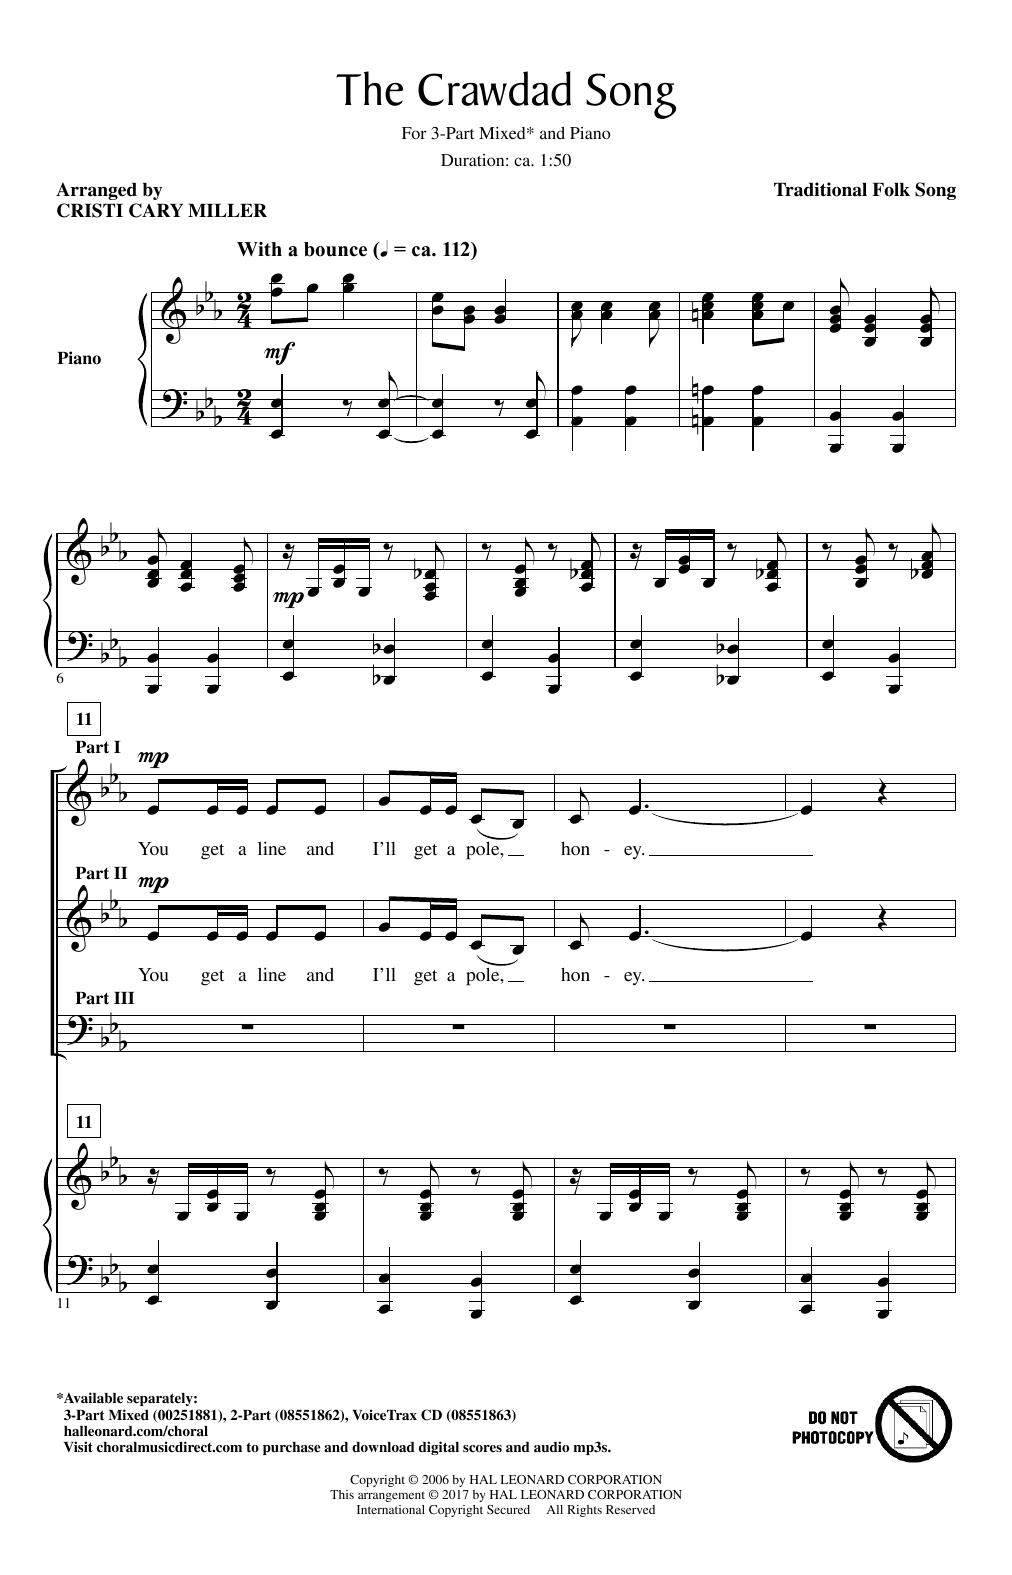 The Crawdad Song Sheet Music